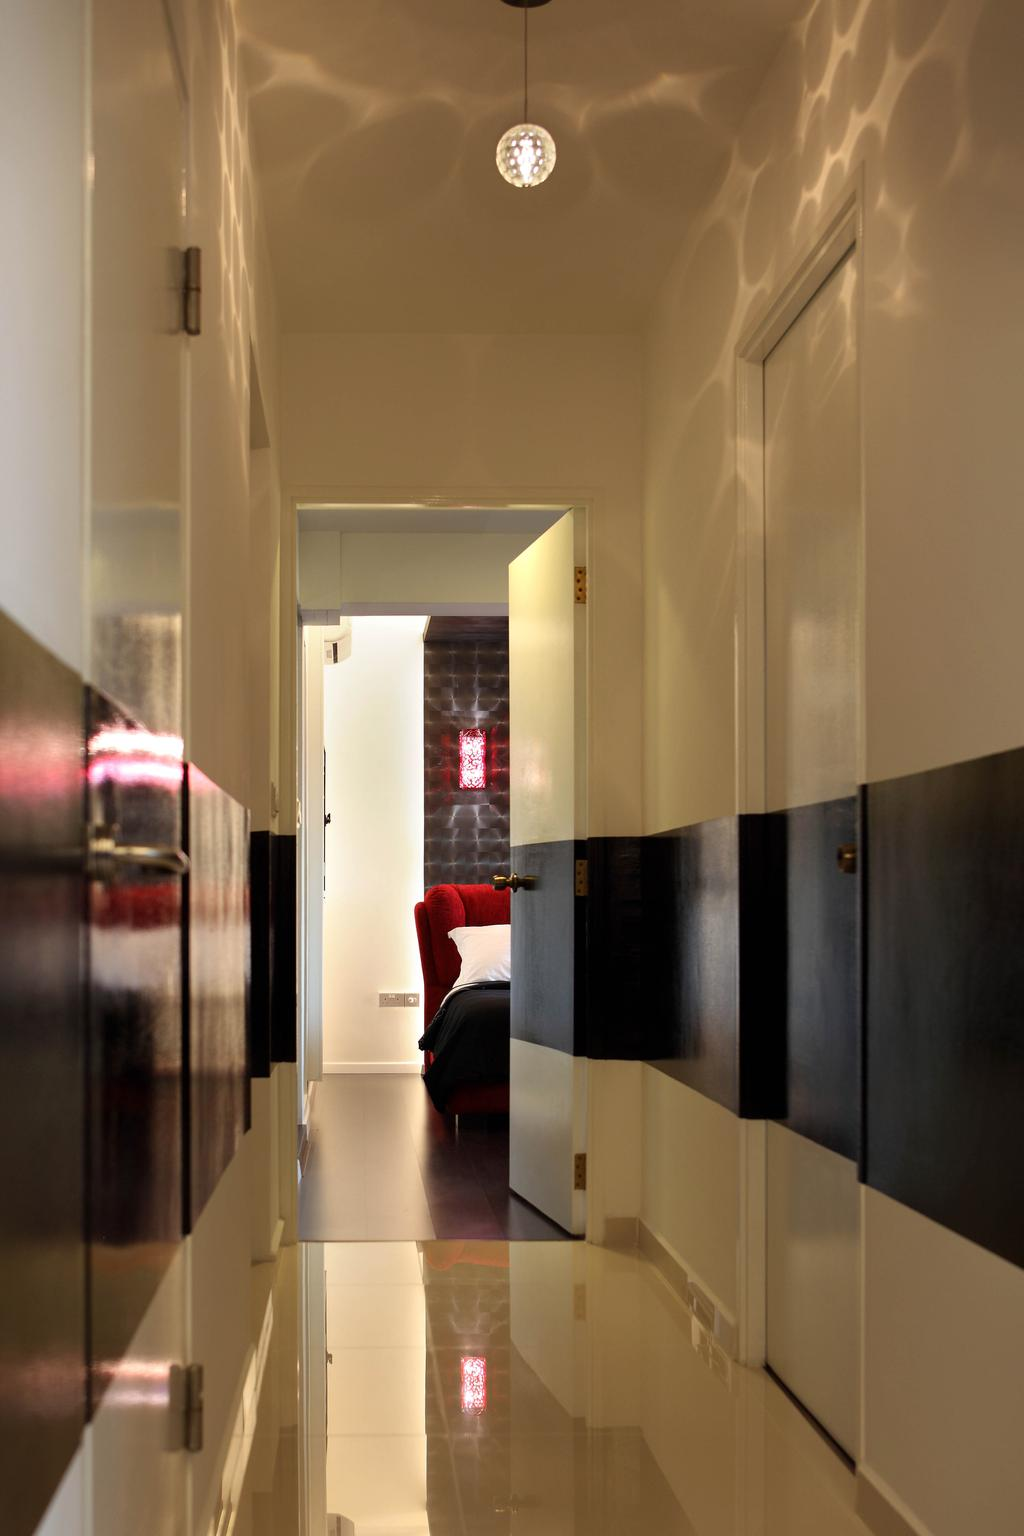 Transitional, HDB, Sengkang West Avenue (Block 438B), Interior Designer, De Exclusive Design Group, Wallway, Hallway, Couch, Furniture